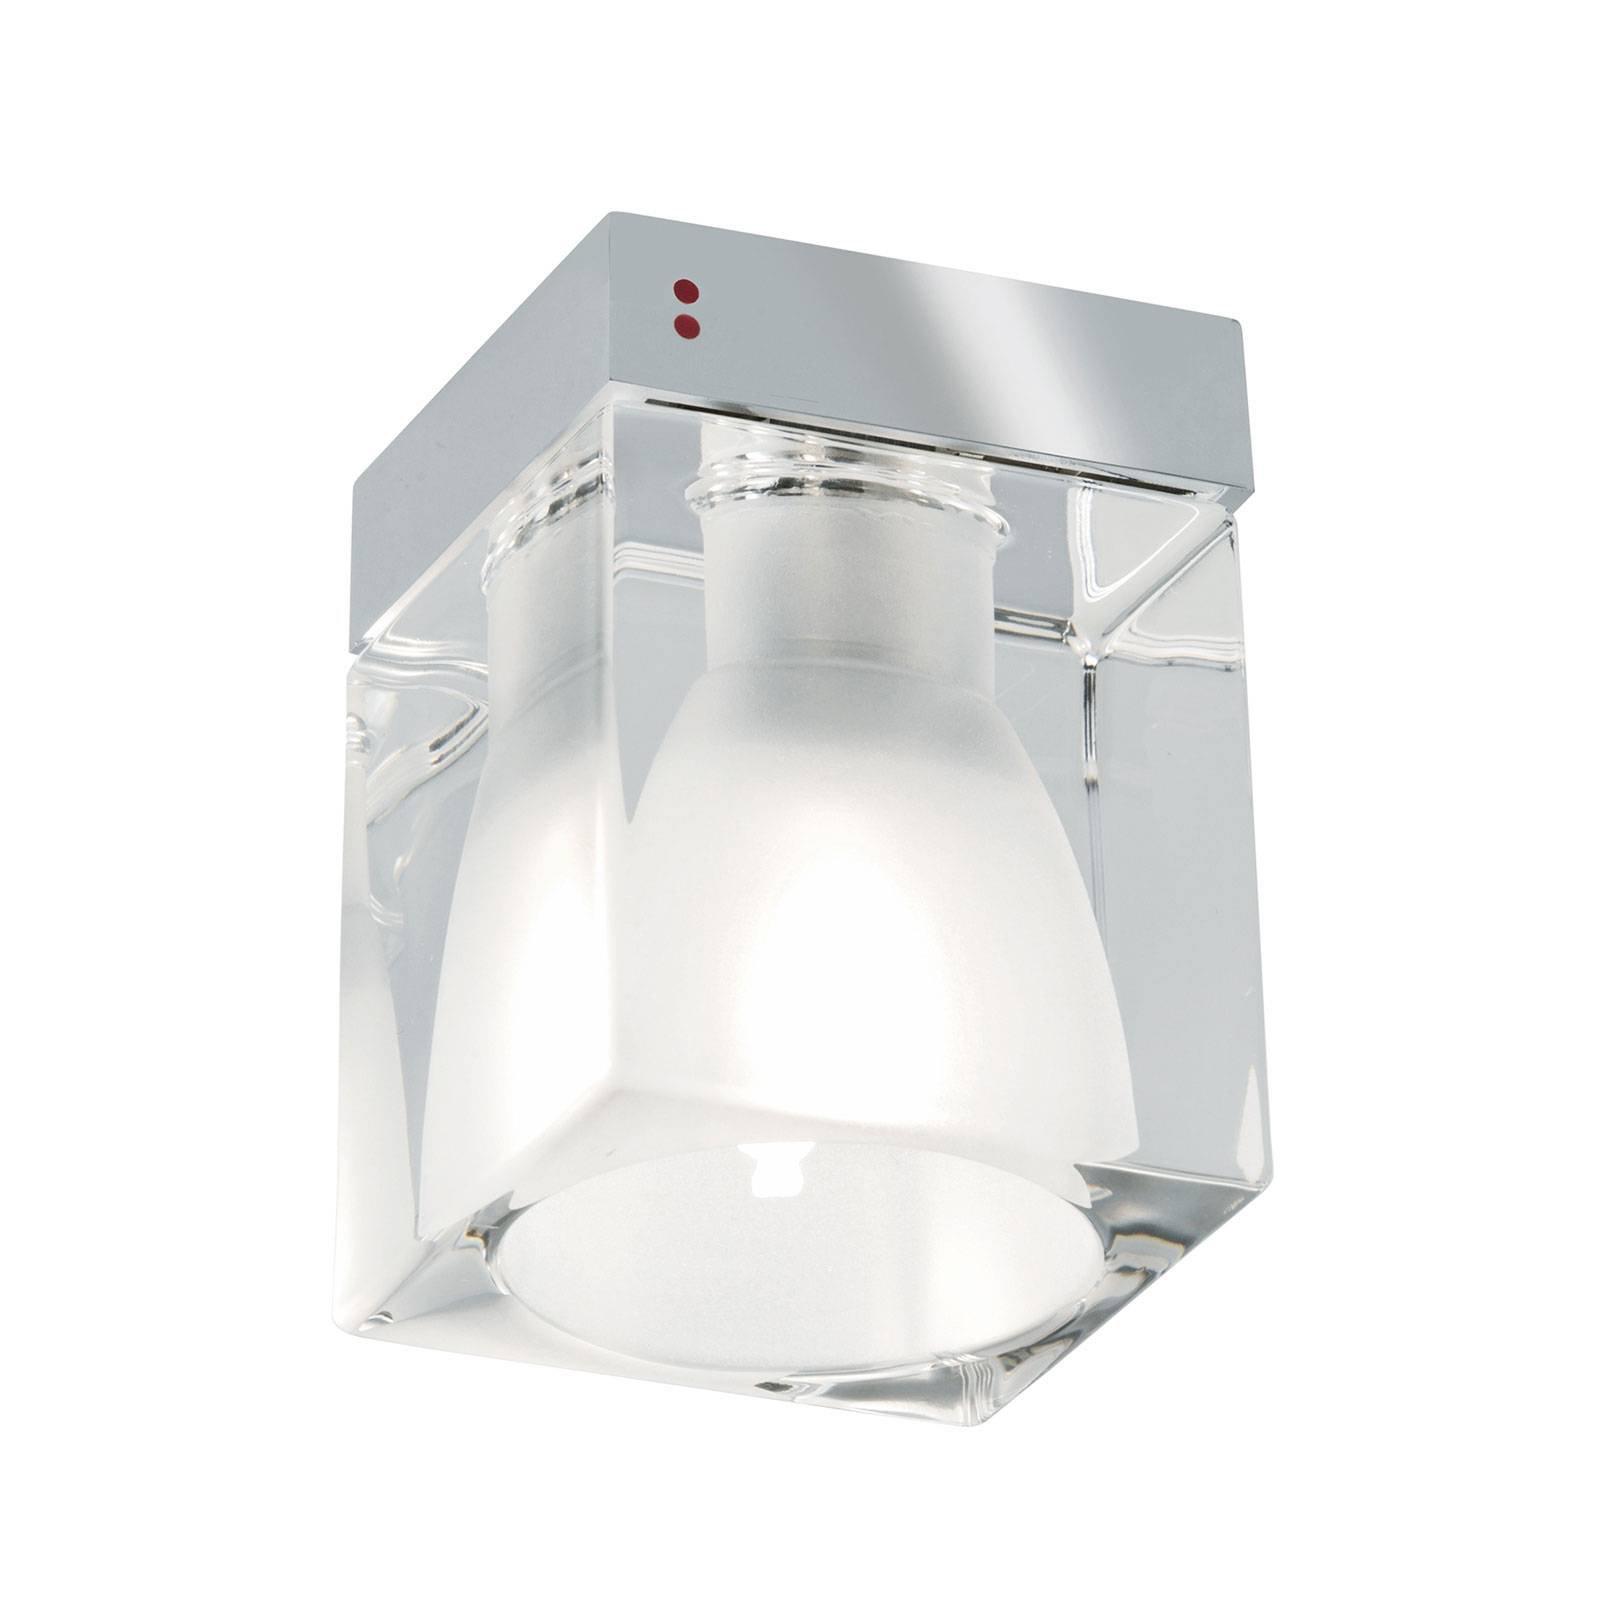 Cubetto taklampe 1 lyskilde, klar